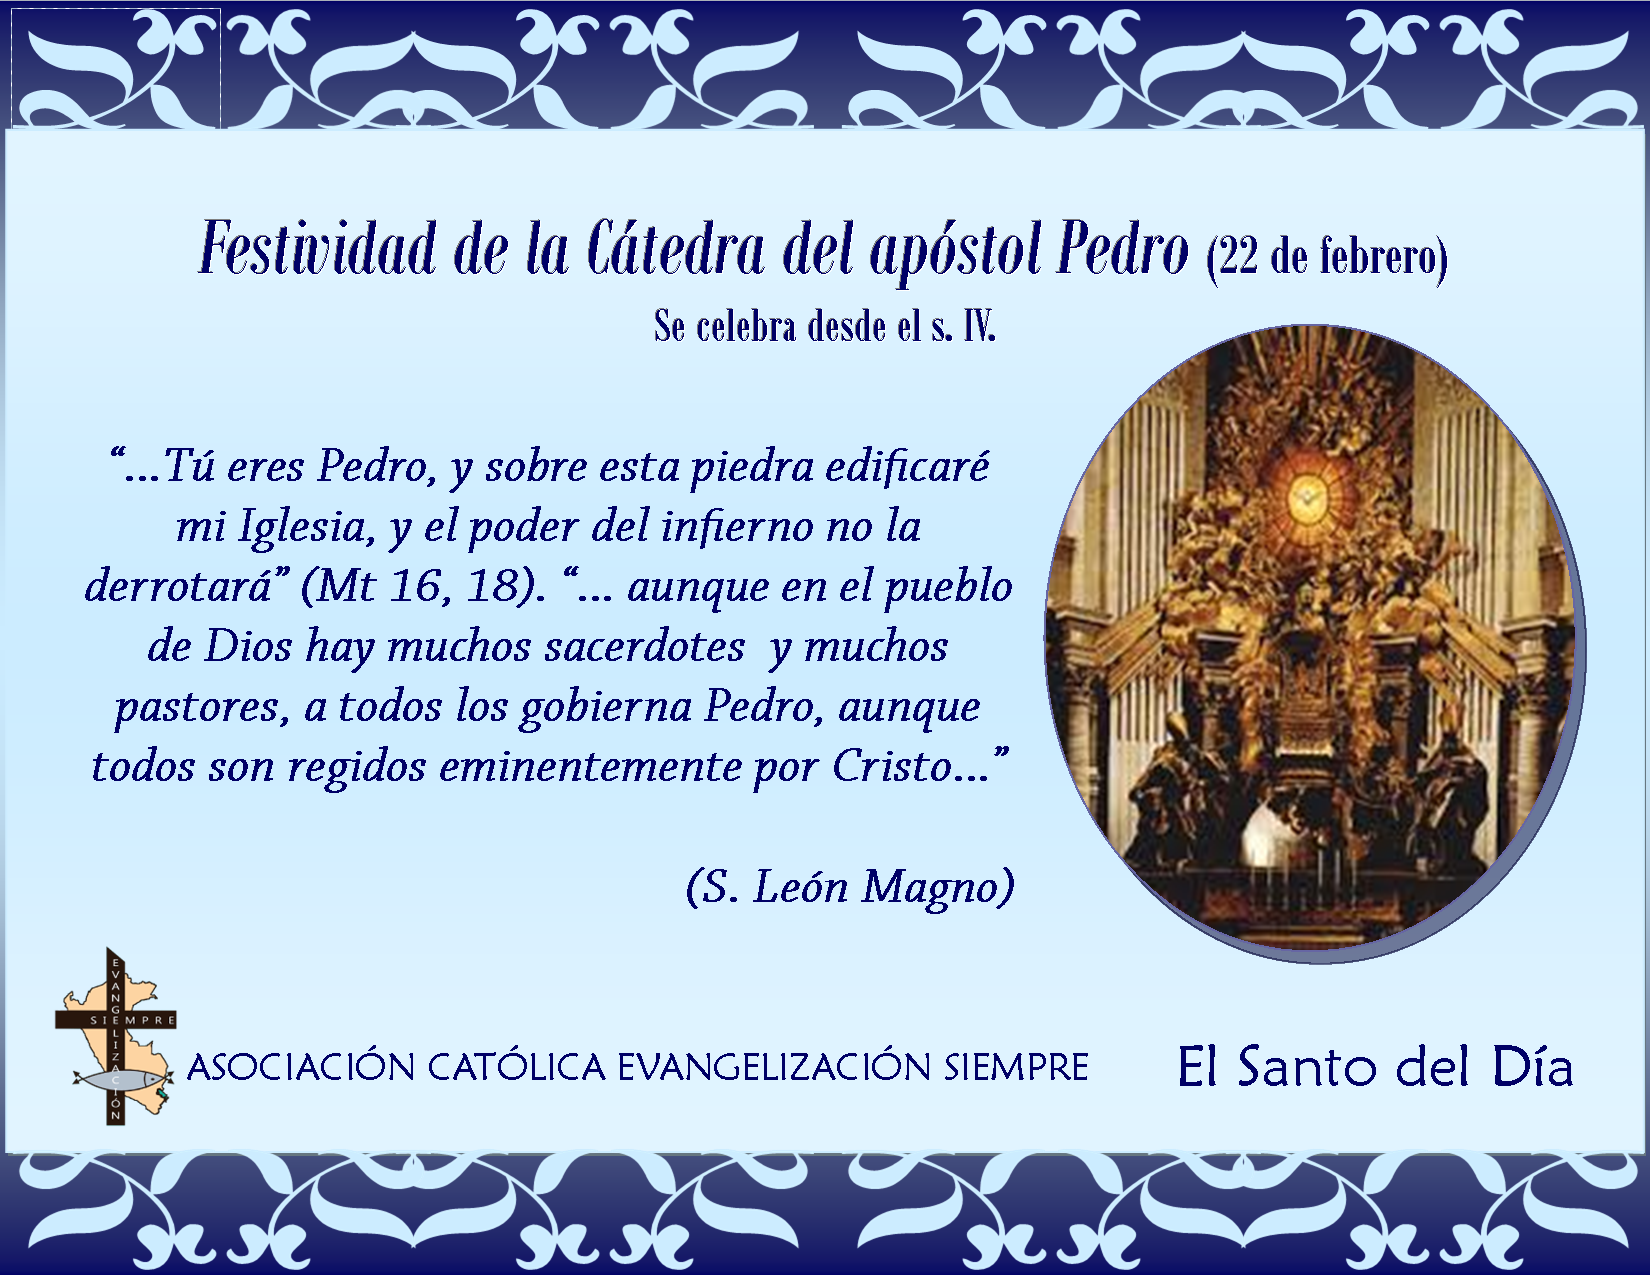 22 febrero Festividad de la Cátedra del apóstol Pedro